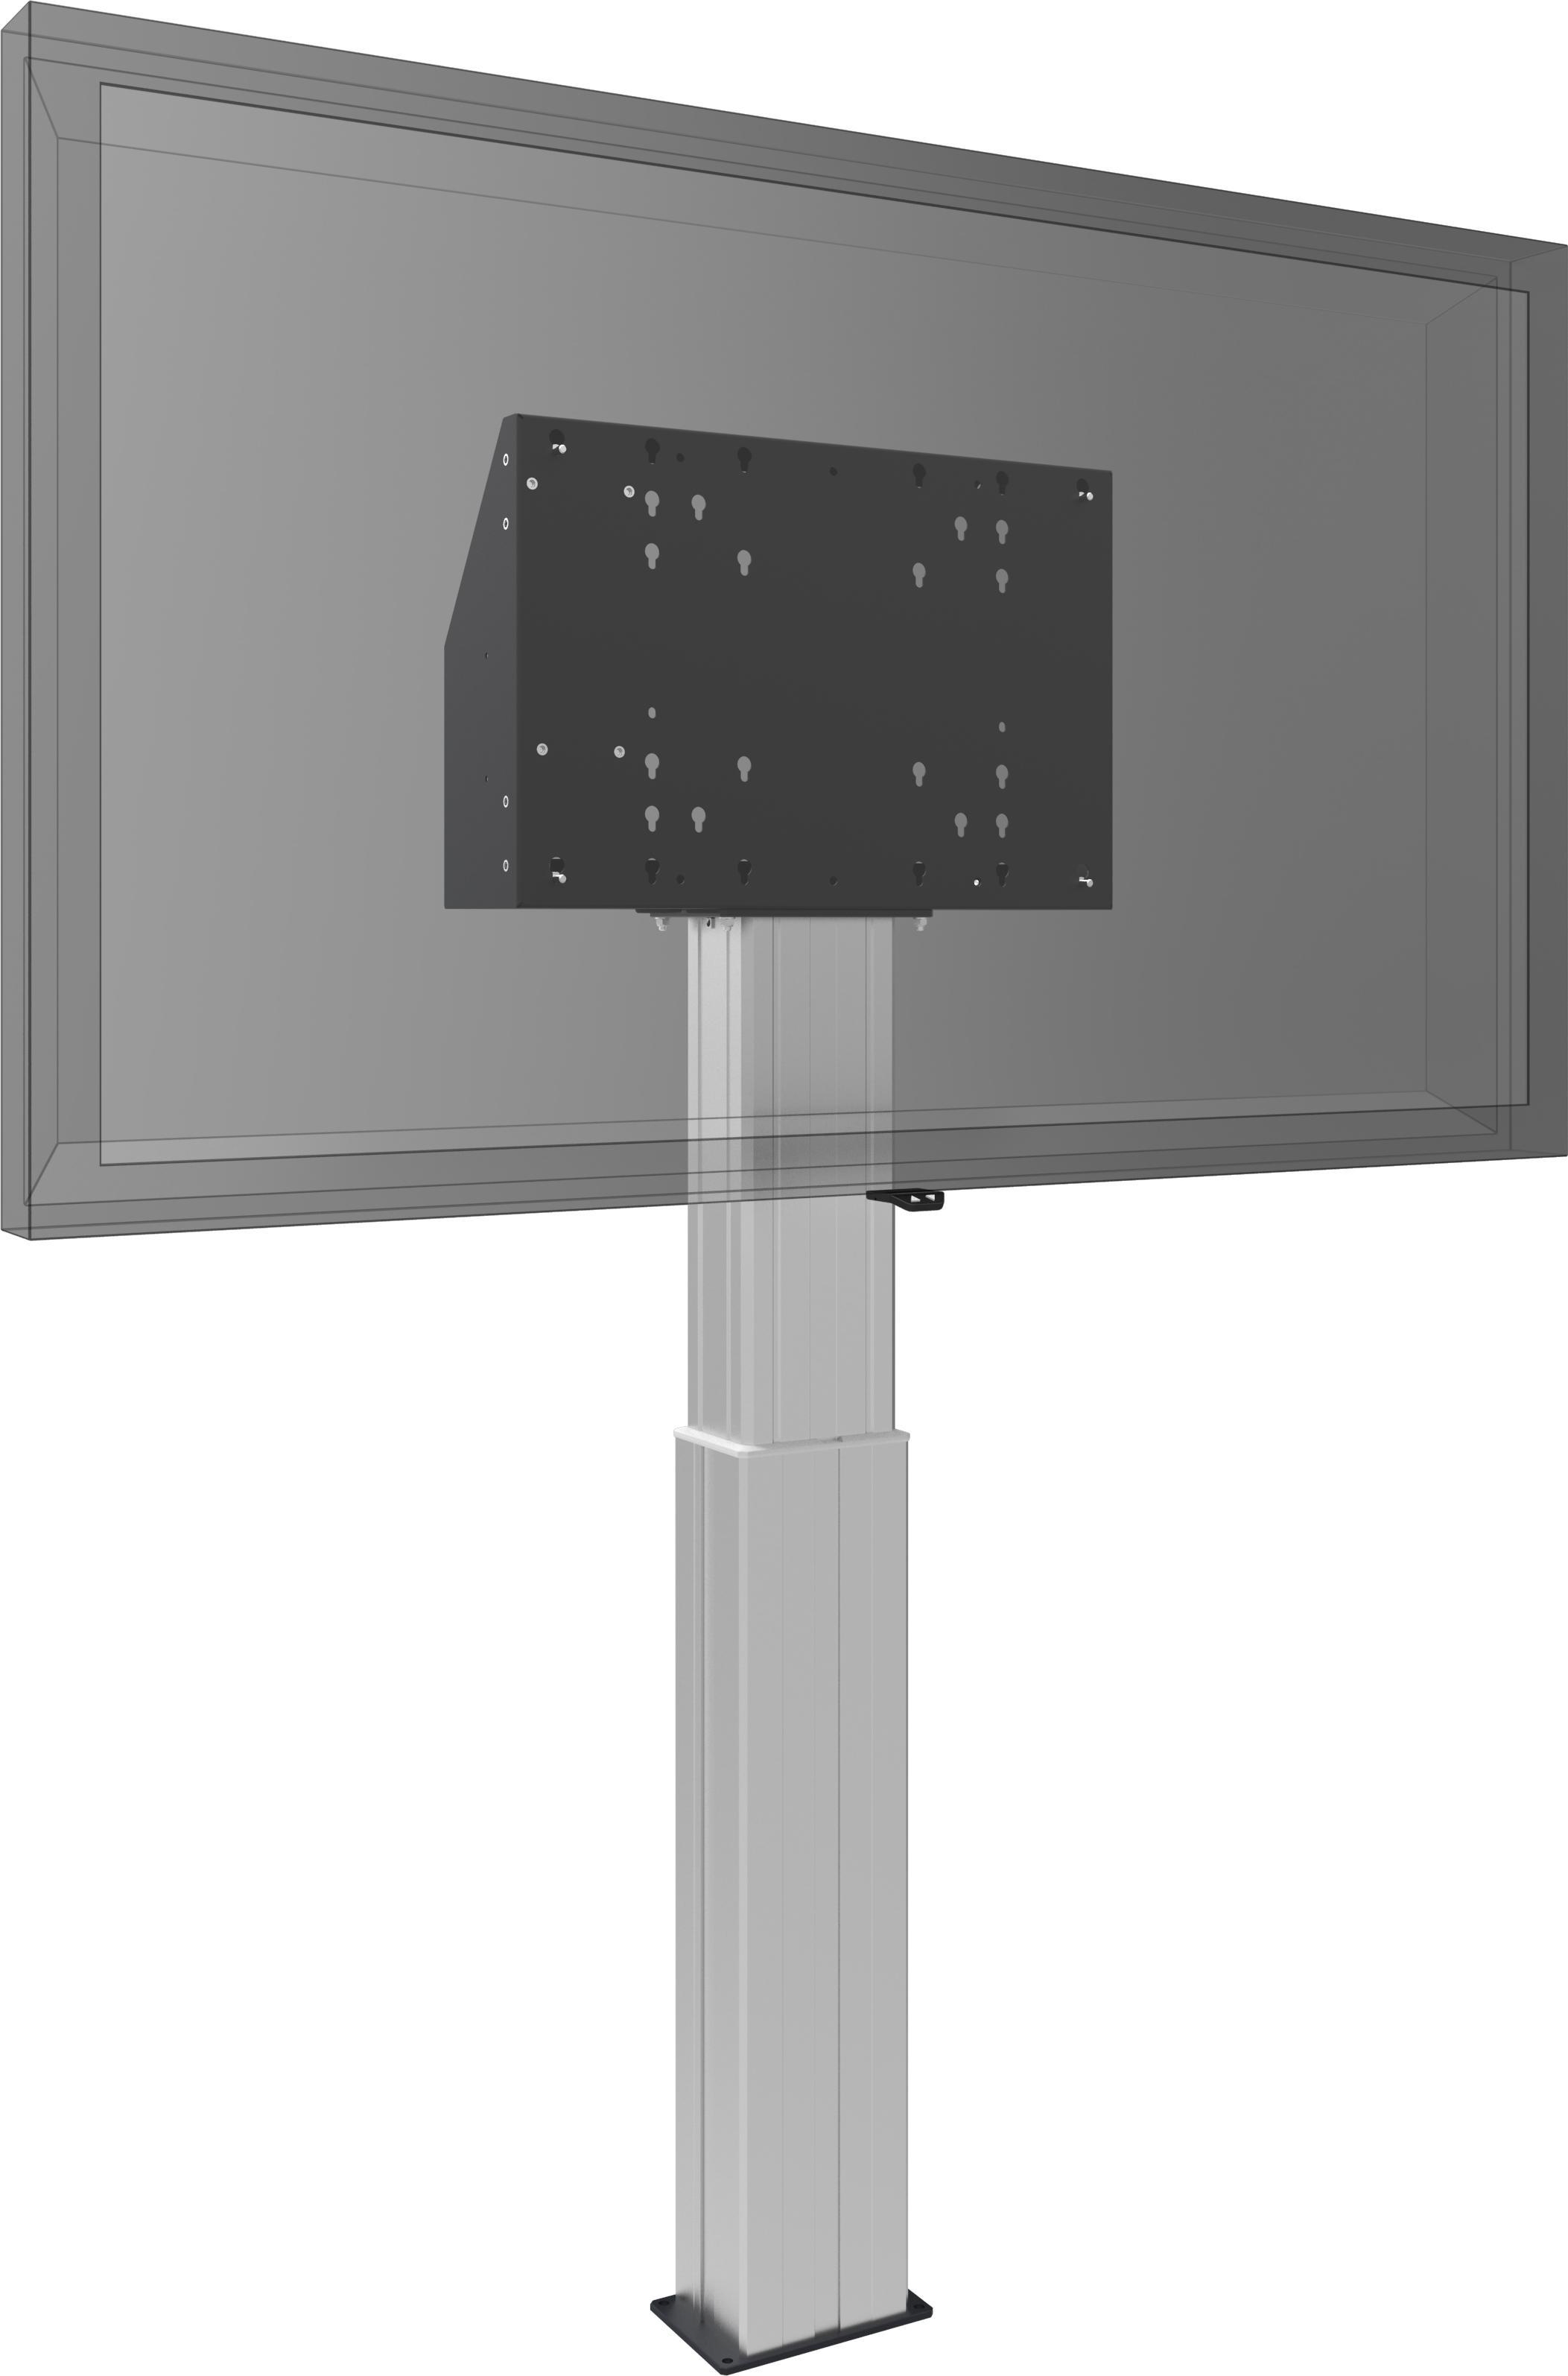 iiyama - floor lift for (touch-) flat screens